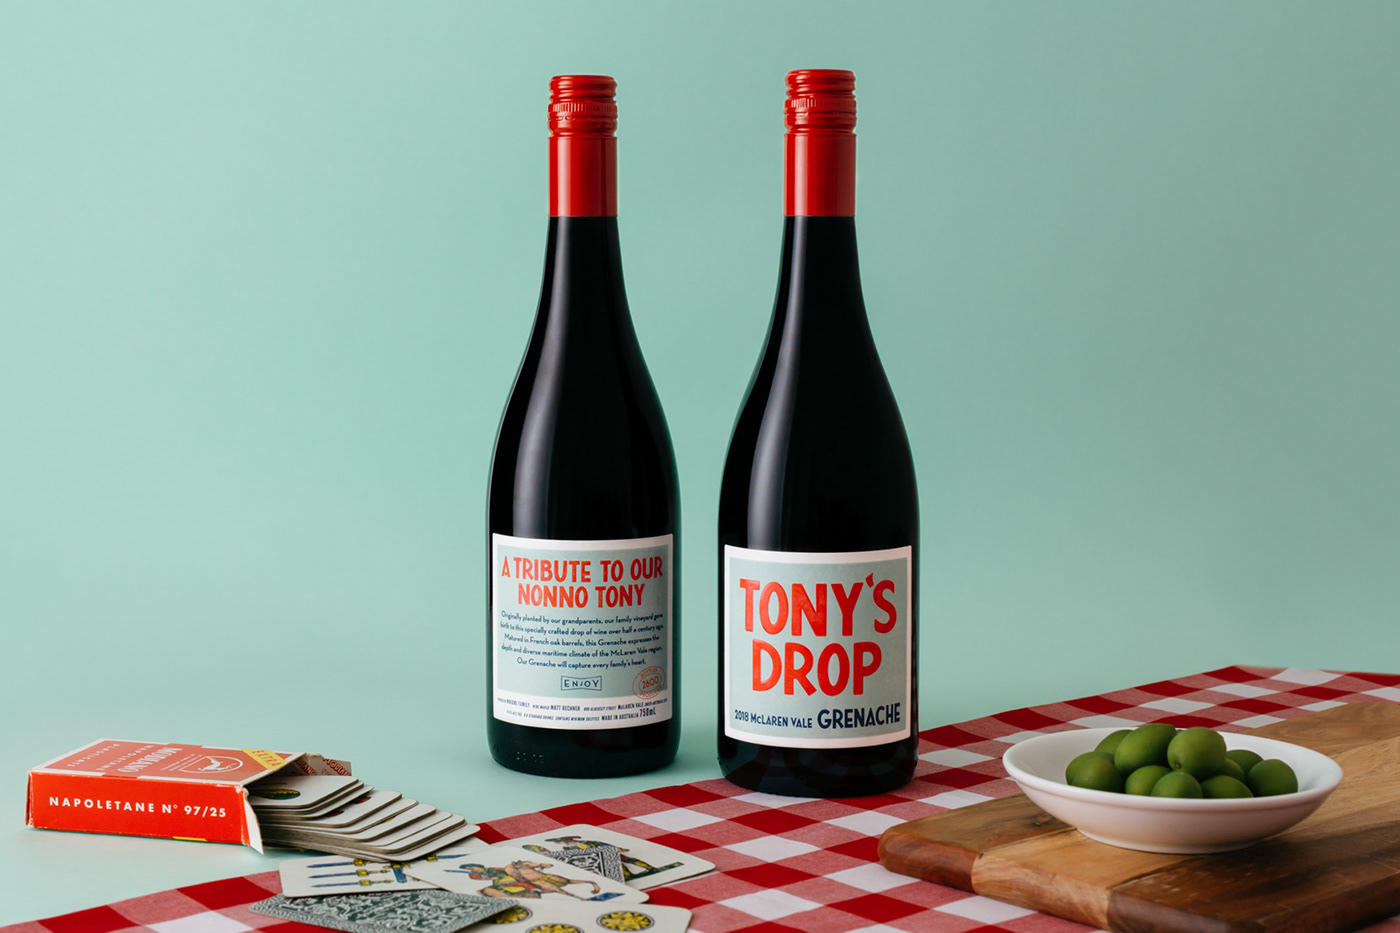 Australia,branding ,graphic design ,logo,Packaging,wine brand,wine label,Wine Packaging